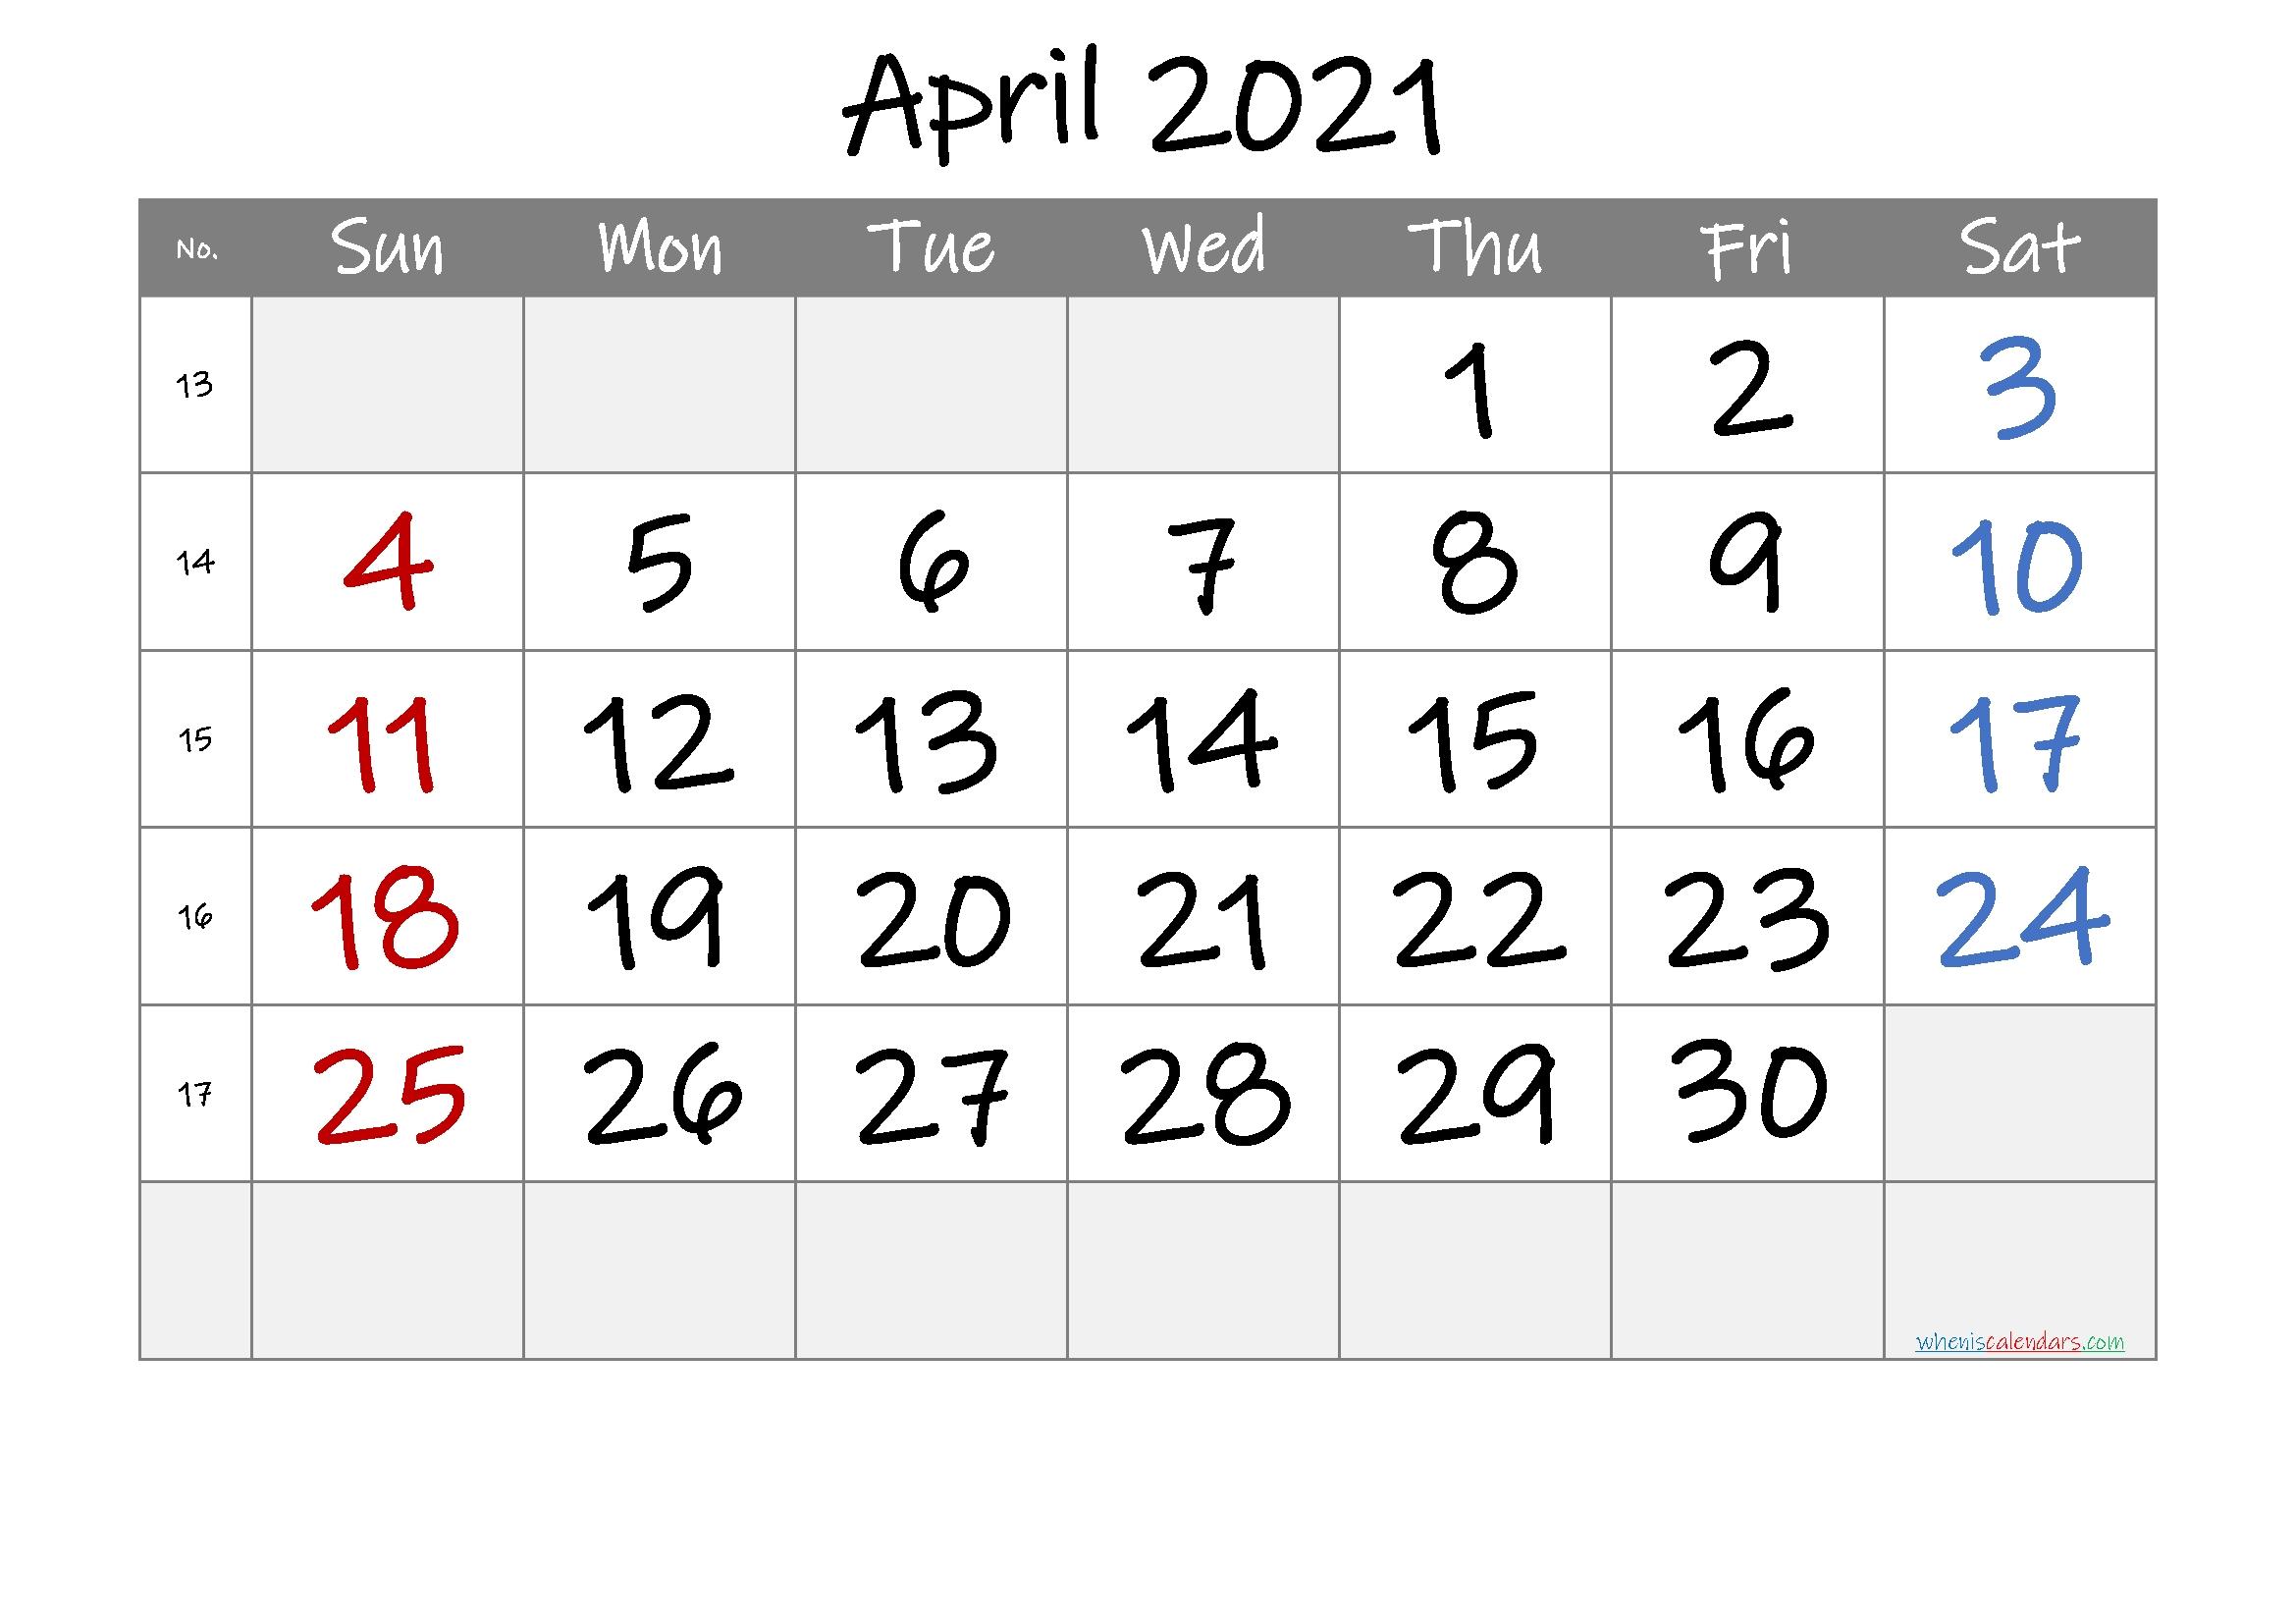 Printable Calendar April 2021 - 6 Templates   Free Printable 2020 Monthly Calendar With Holidays Calendar November 2020 To April 2021